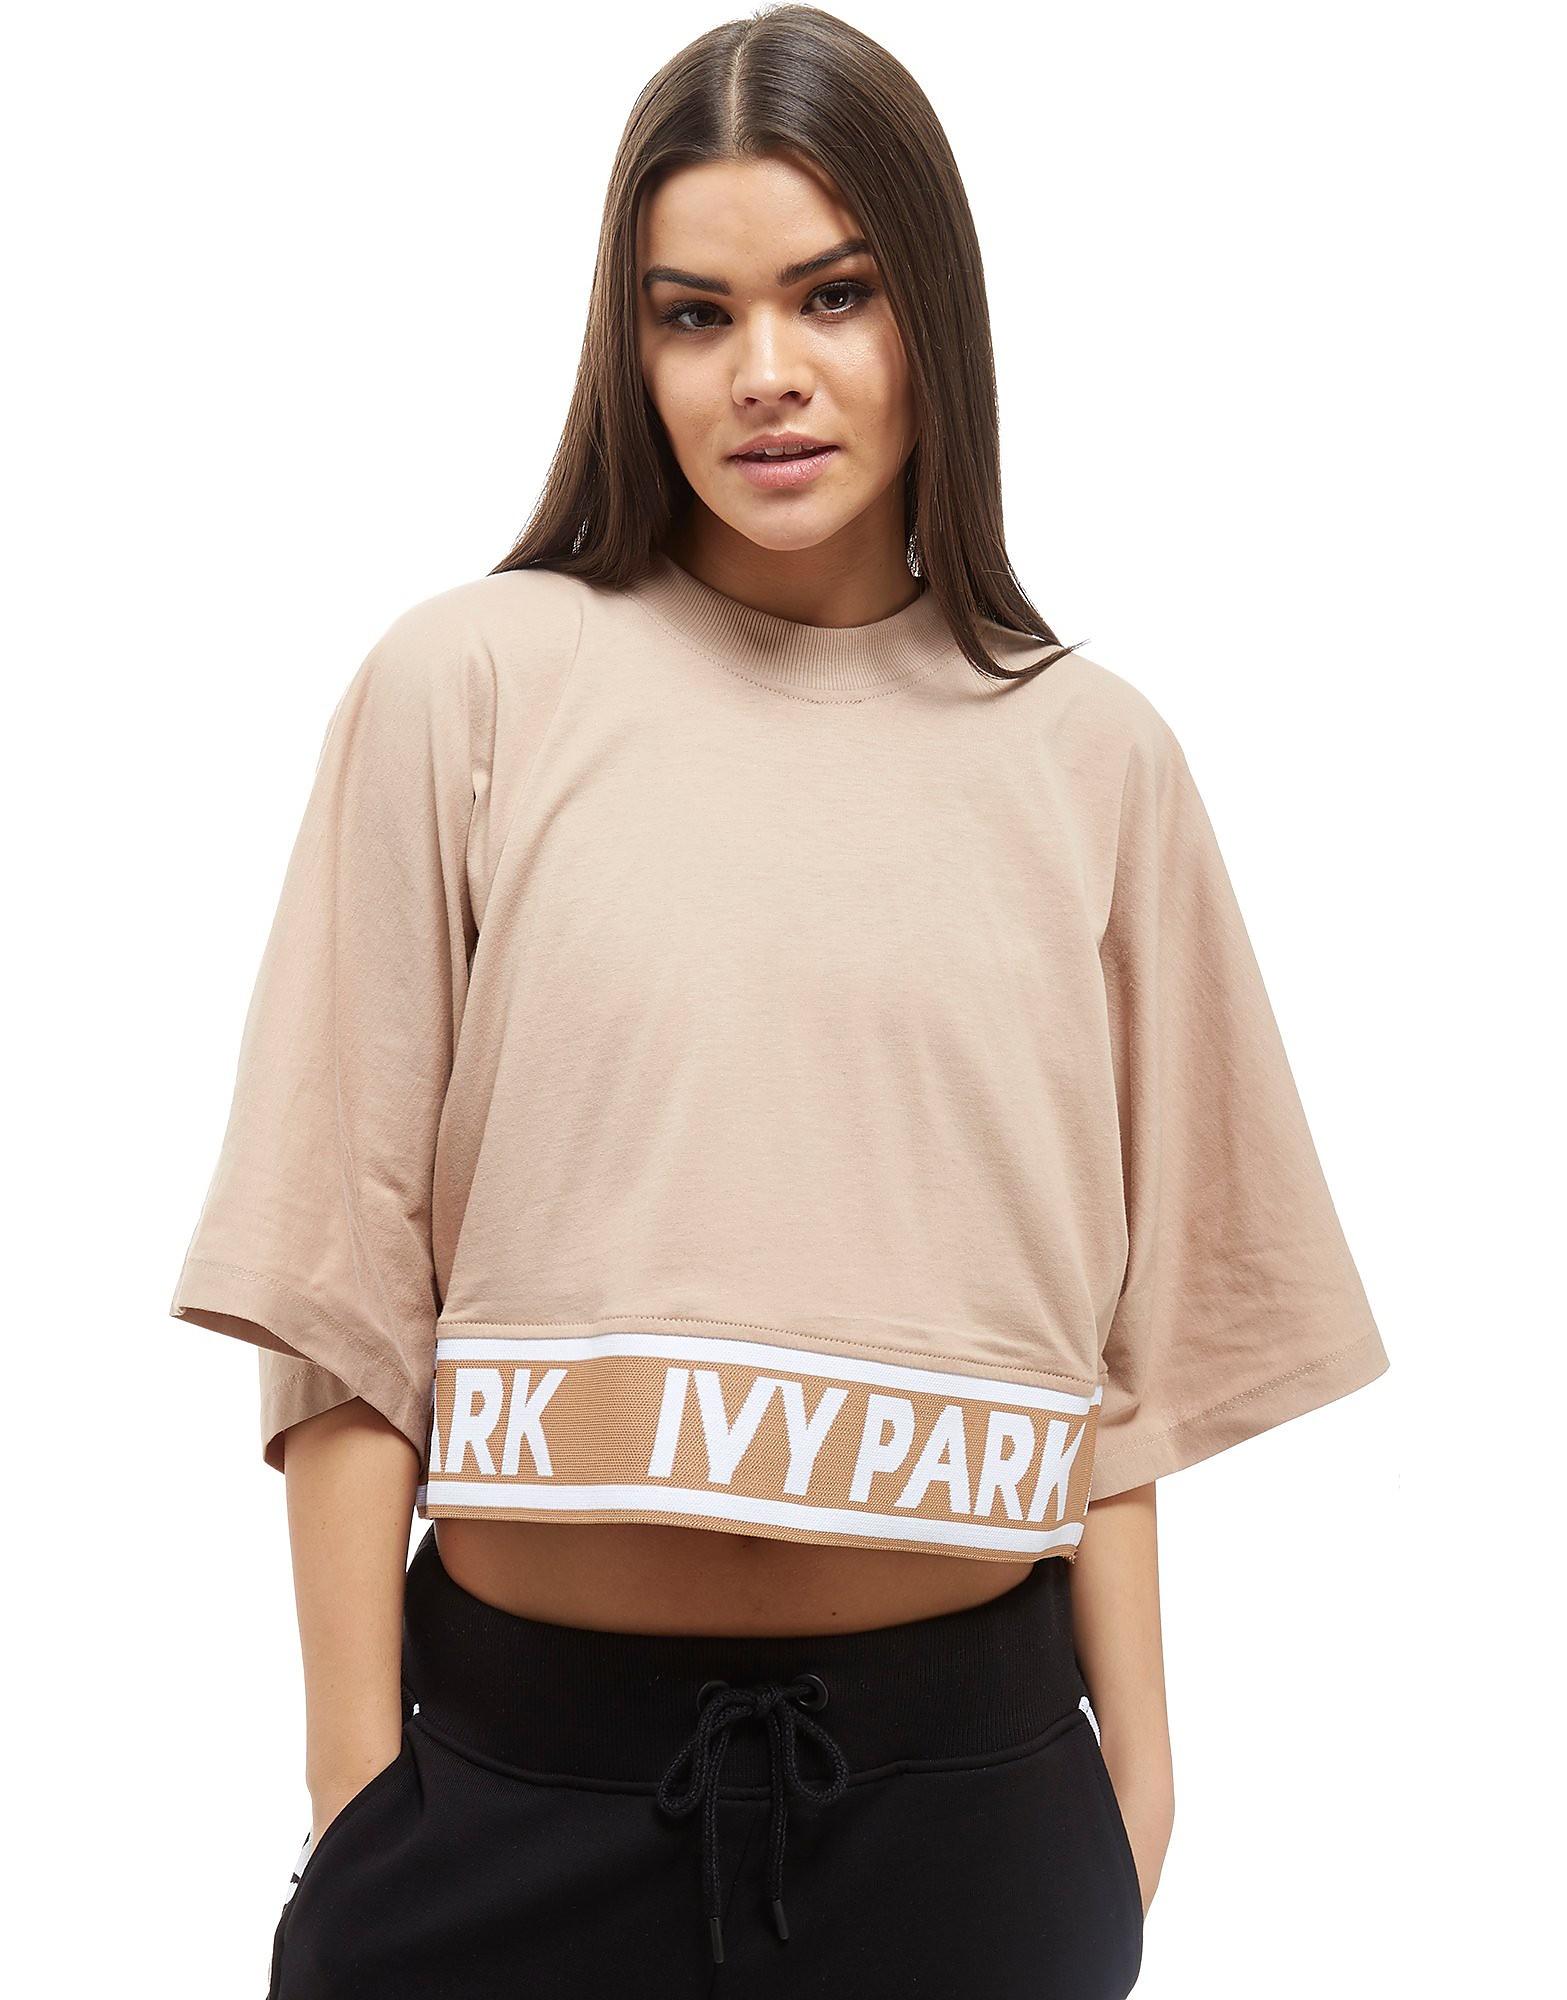 IVY PARK Tape Crop T-Shirt